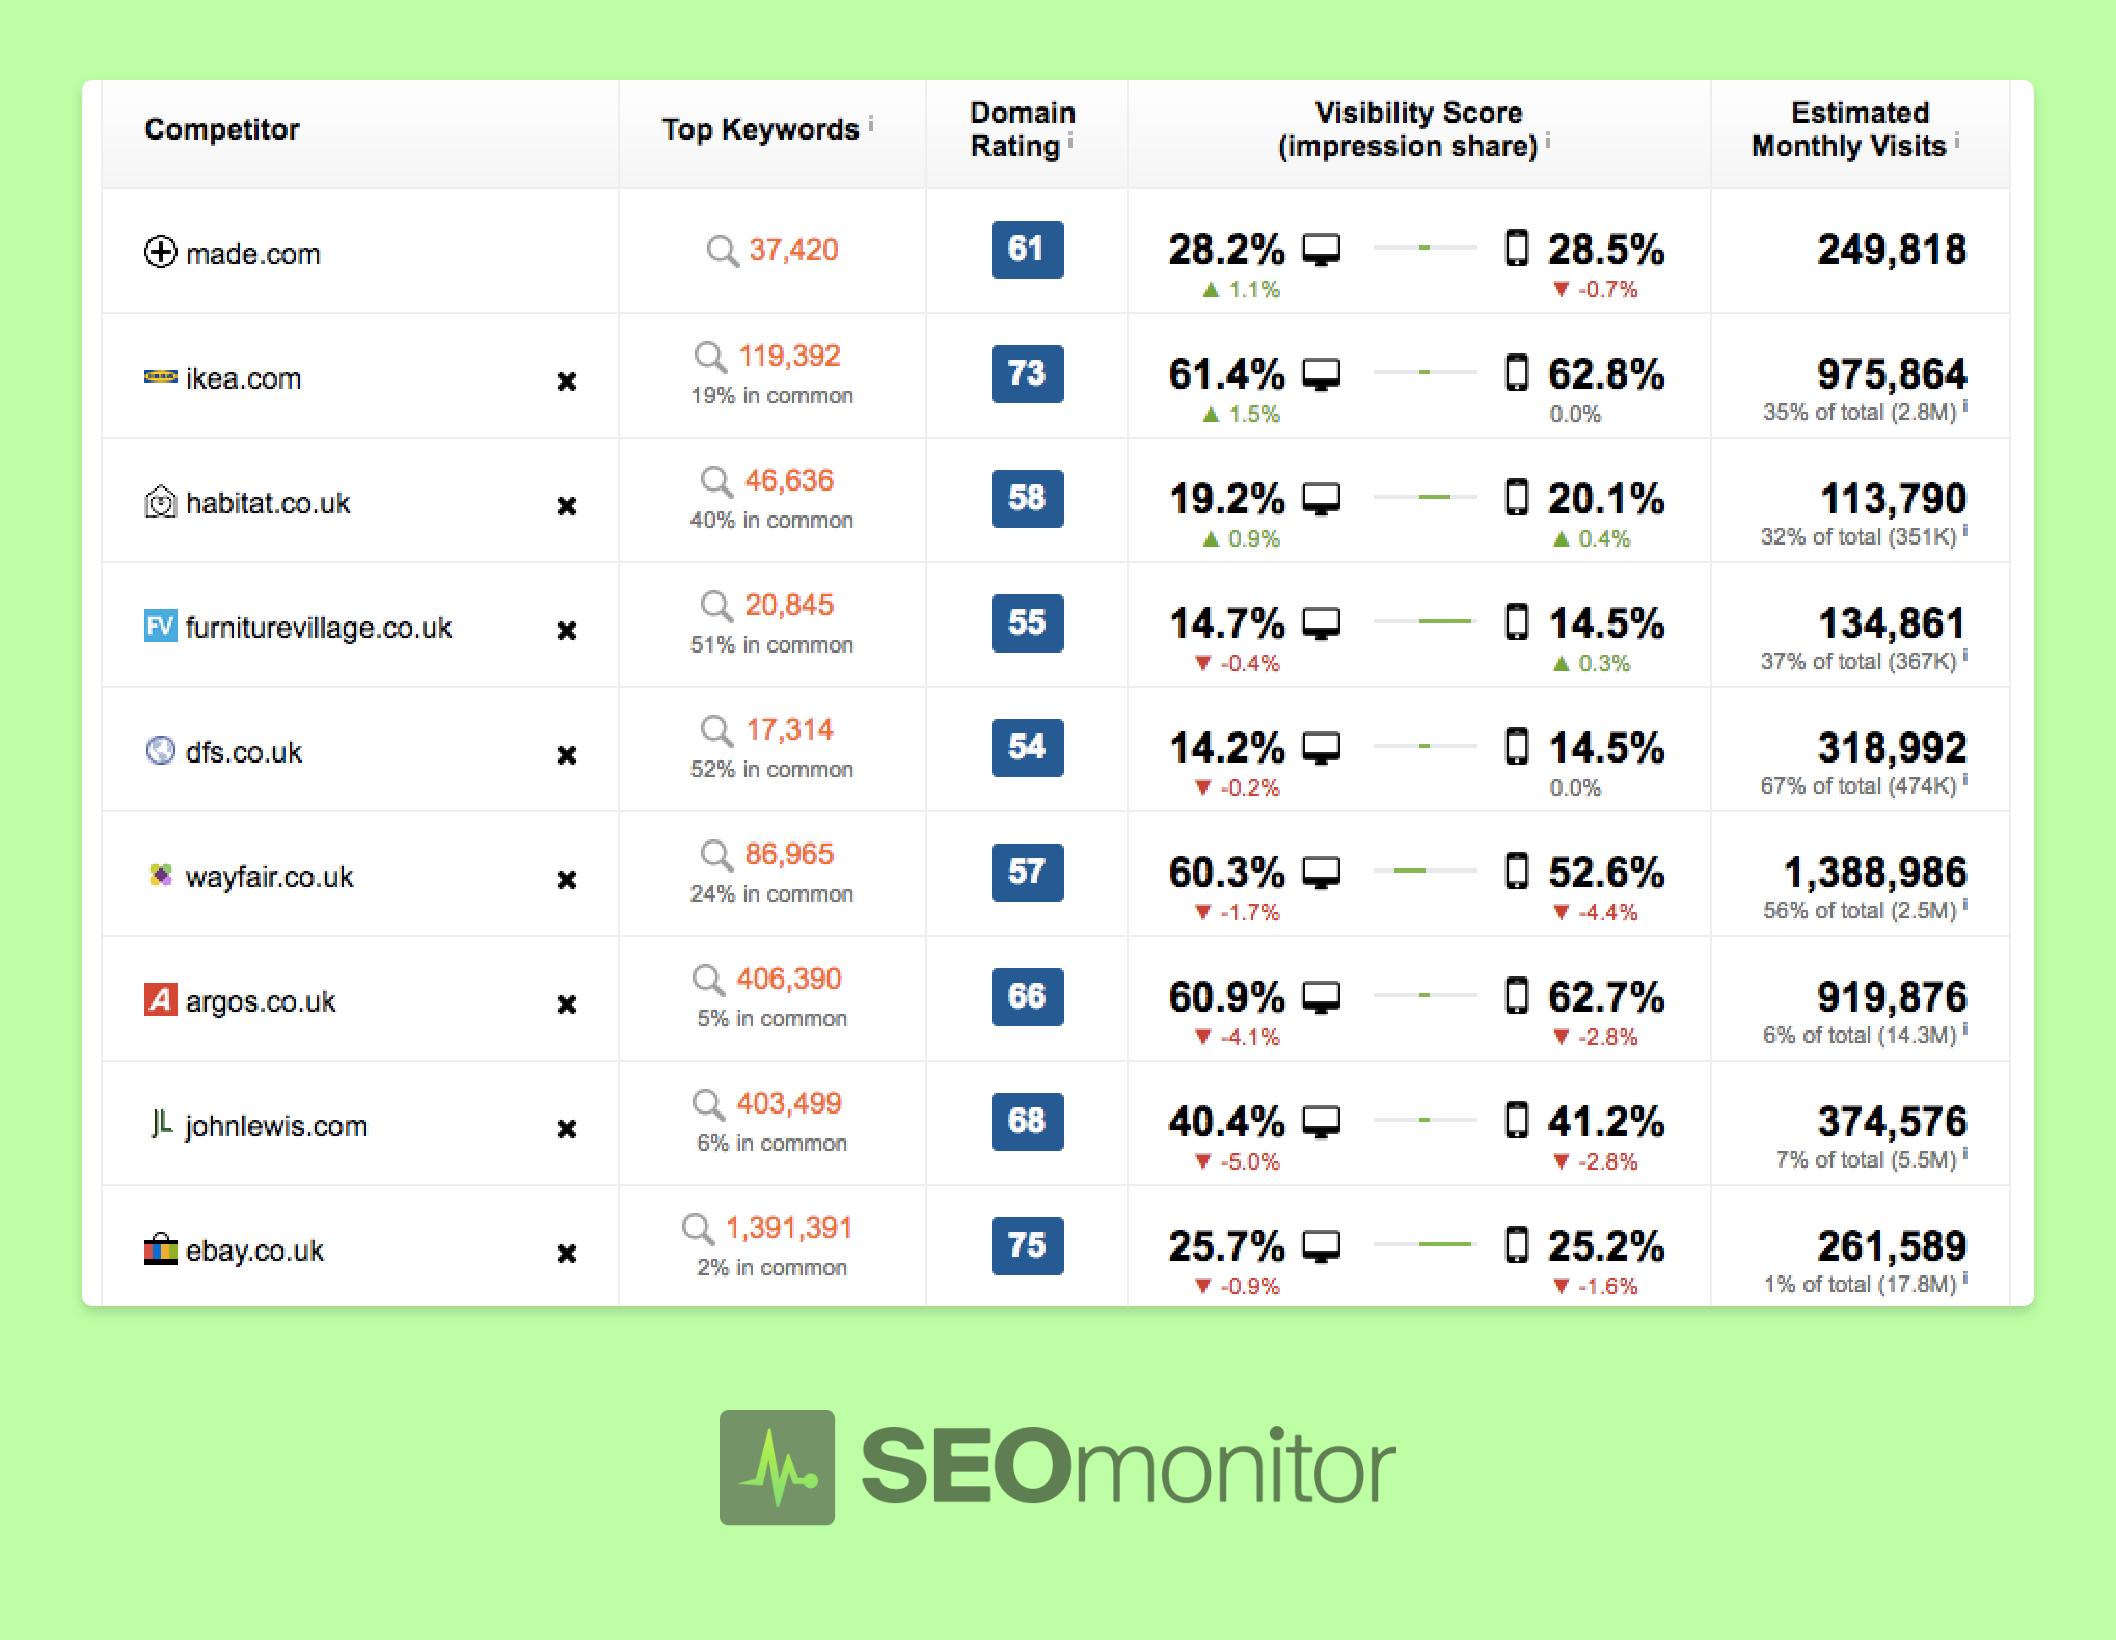 SEOmonitor Competitor analysis